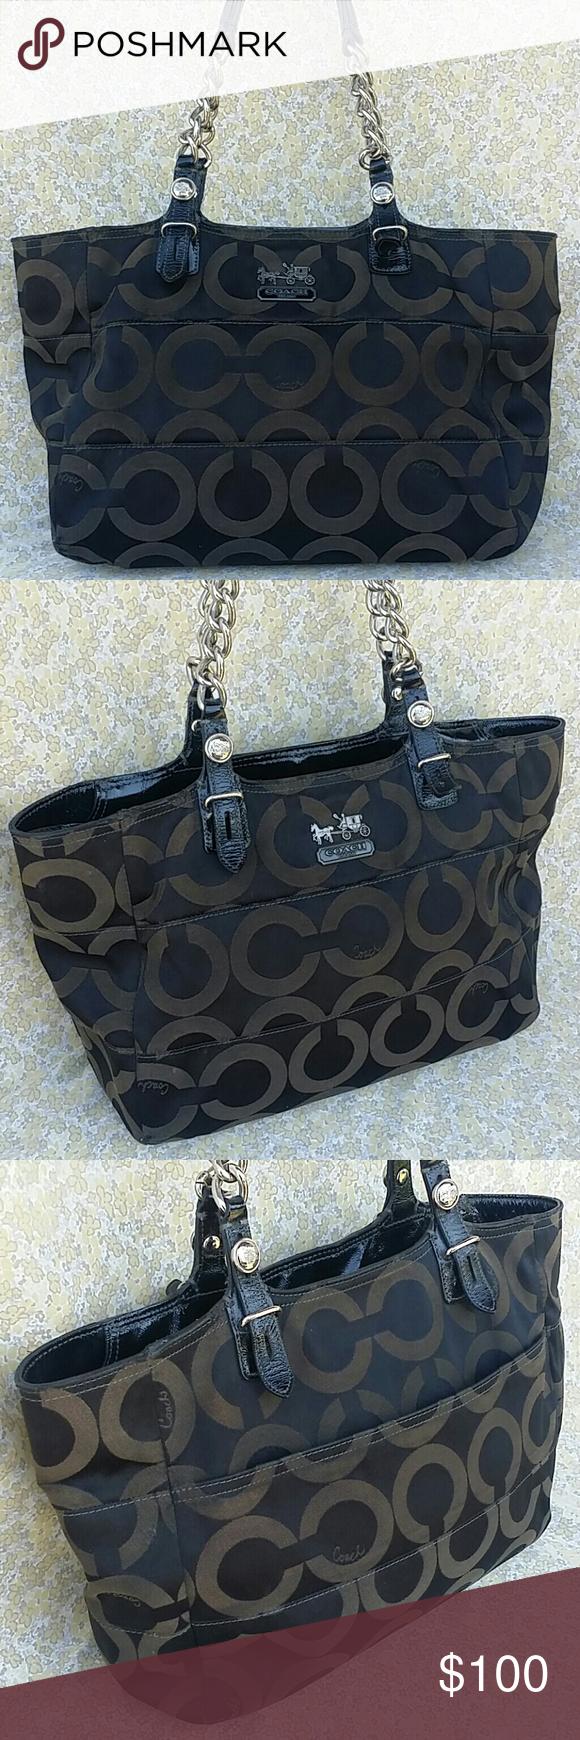 "Coach 14133 Madison Tribeca Opt Art Tote Handbag Coach 14133 Madison Tribeca Opt Art Tote Handbag Measurements 10"" X 12"" X 4"" Coach Bags Totes"